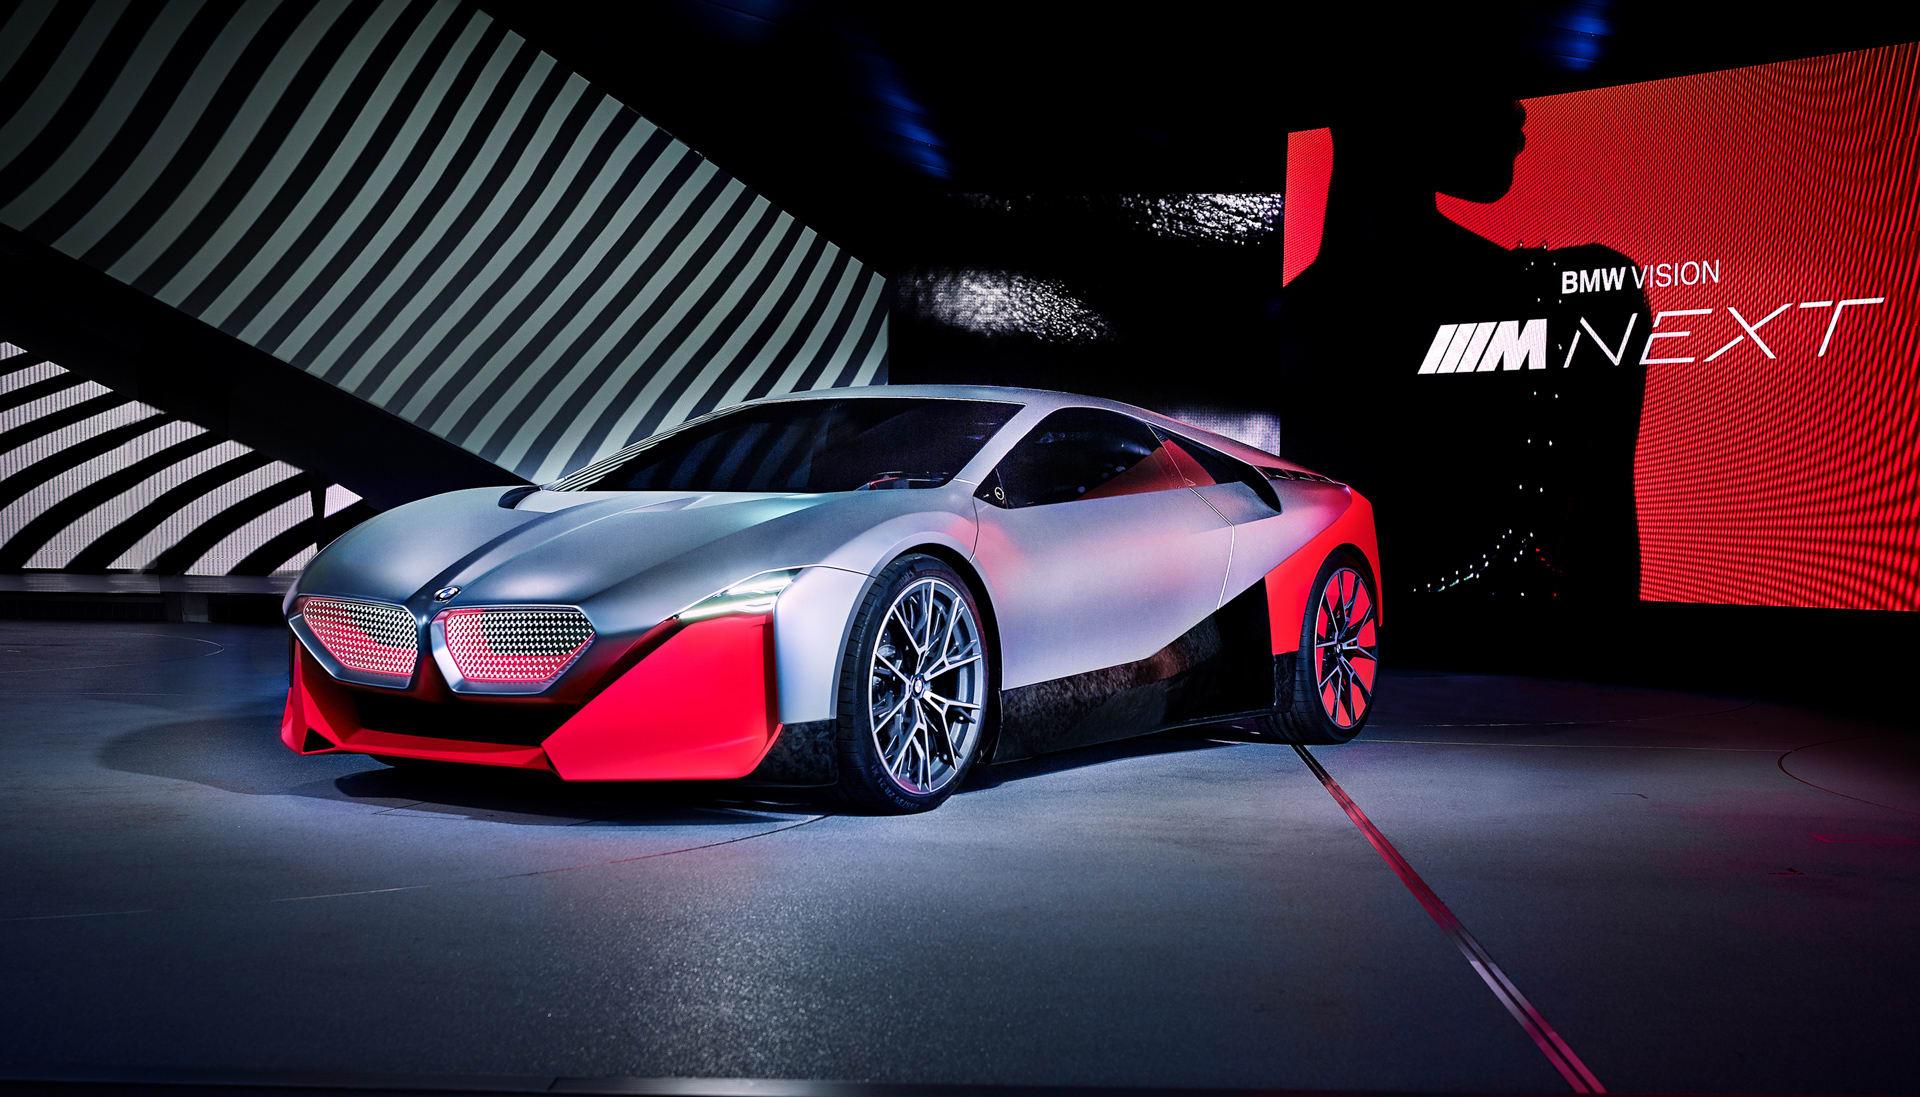 Bmw Vision M Next An Autonomous Car For People Who Love Driving